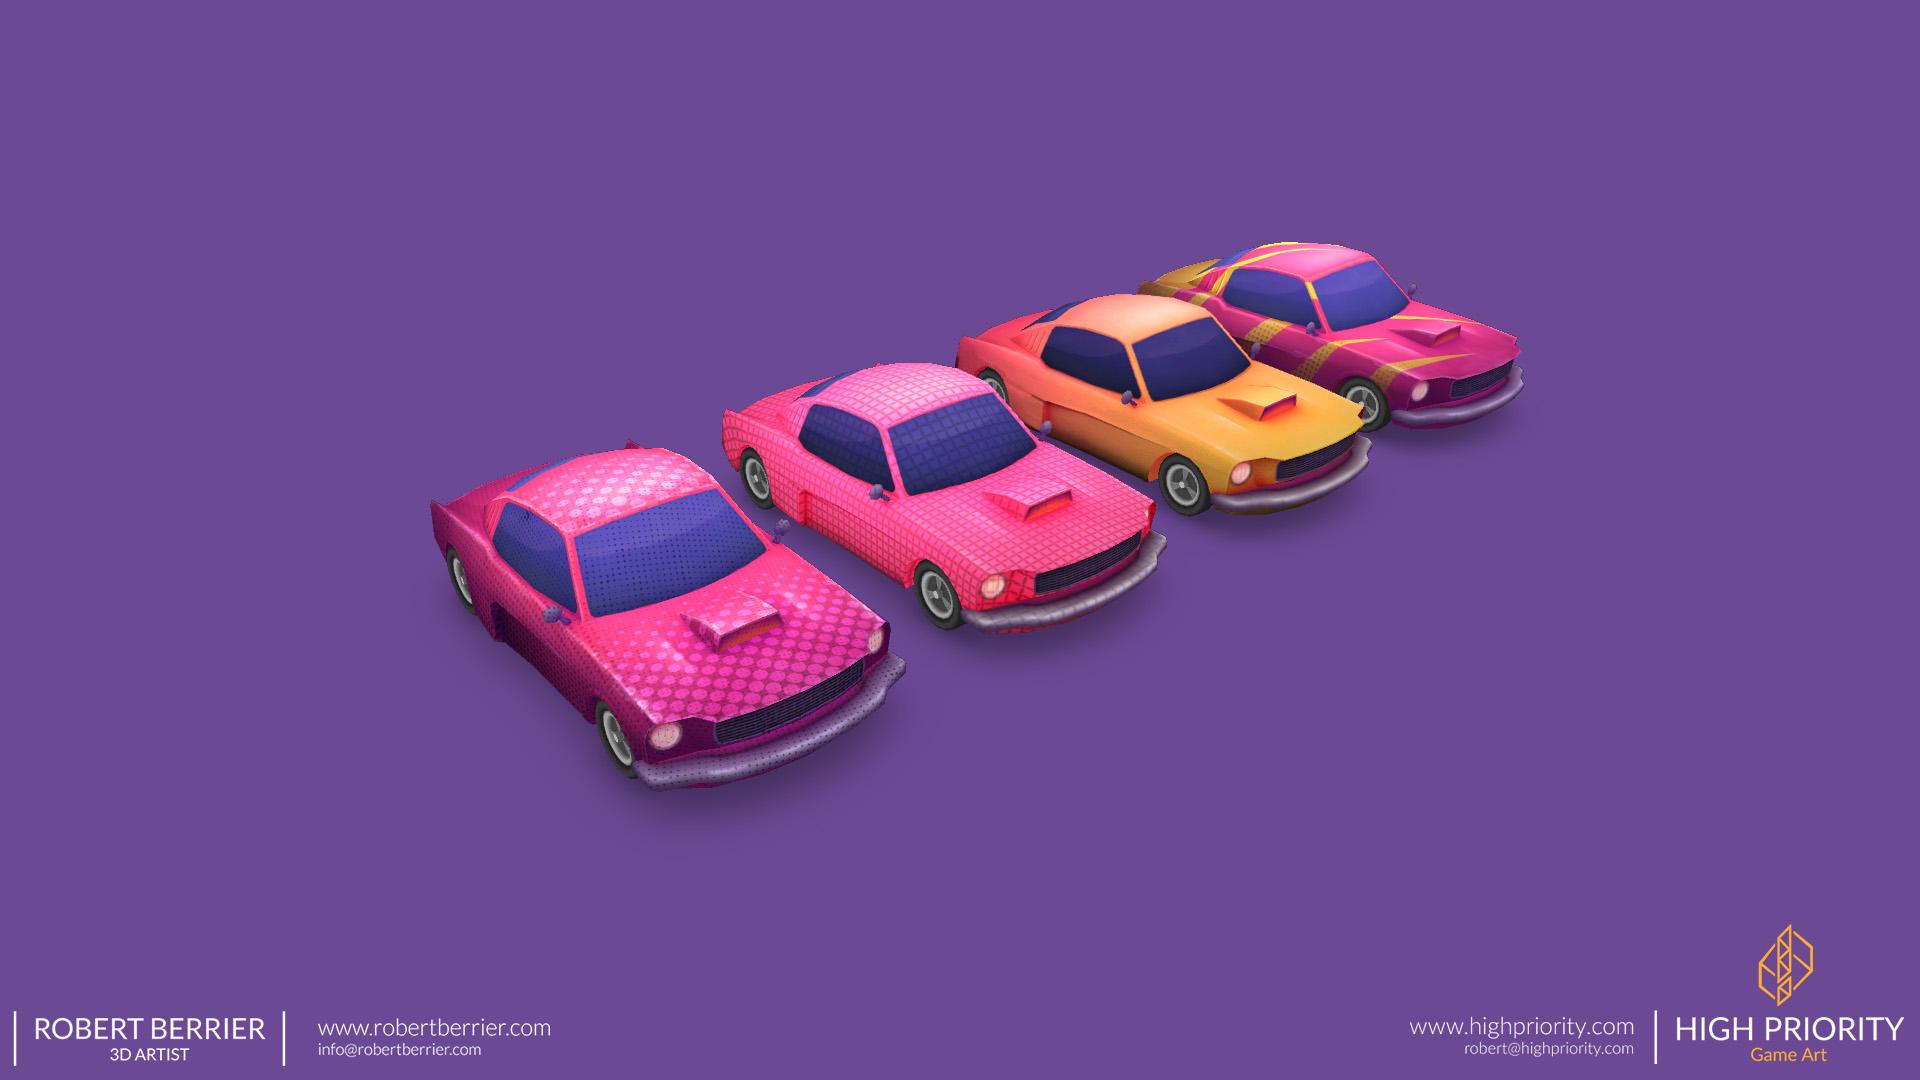 High Priority - Racer Make Way - Cars 01